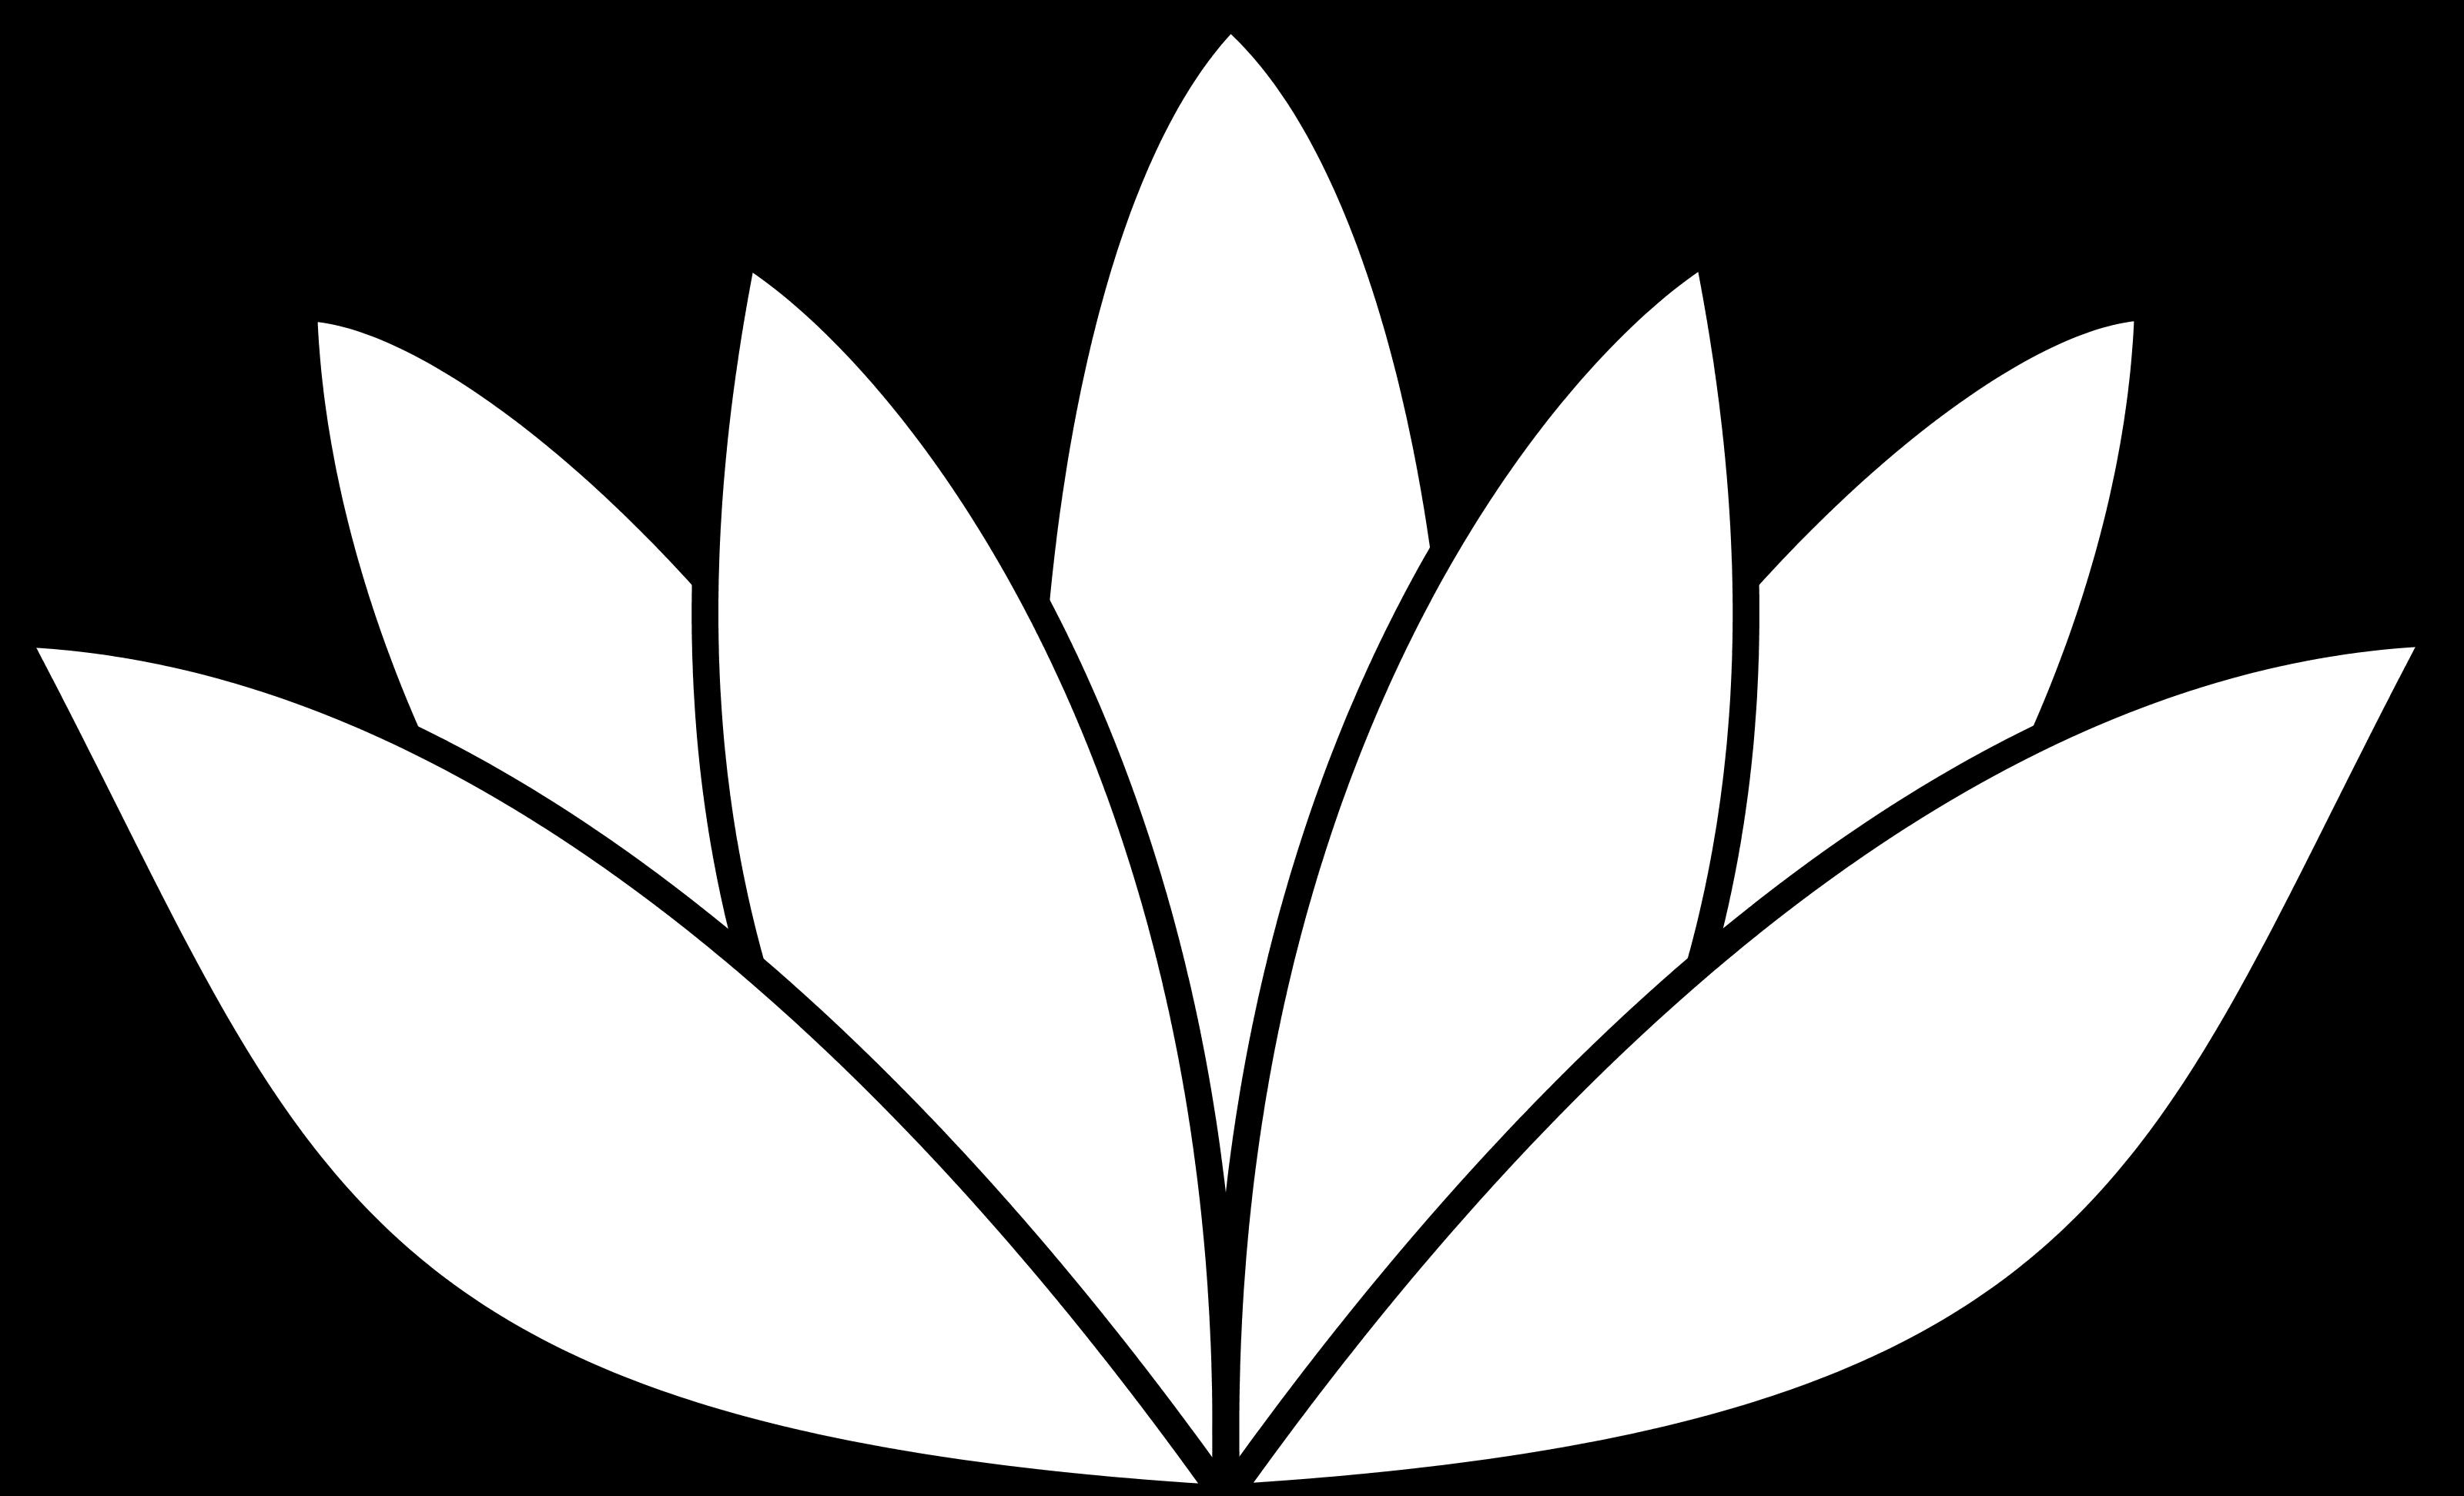 white lotus flower SVG.